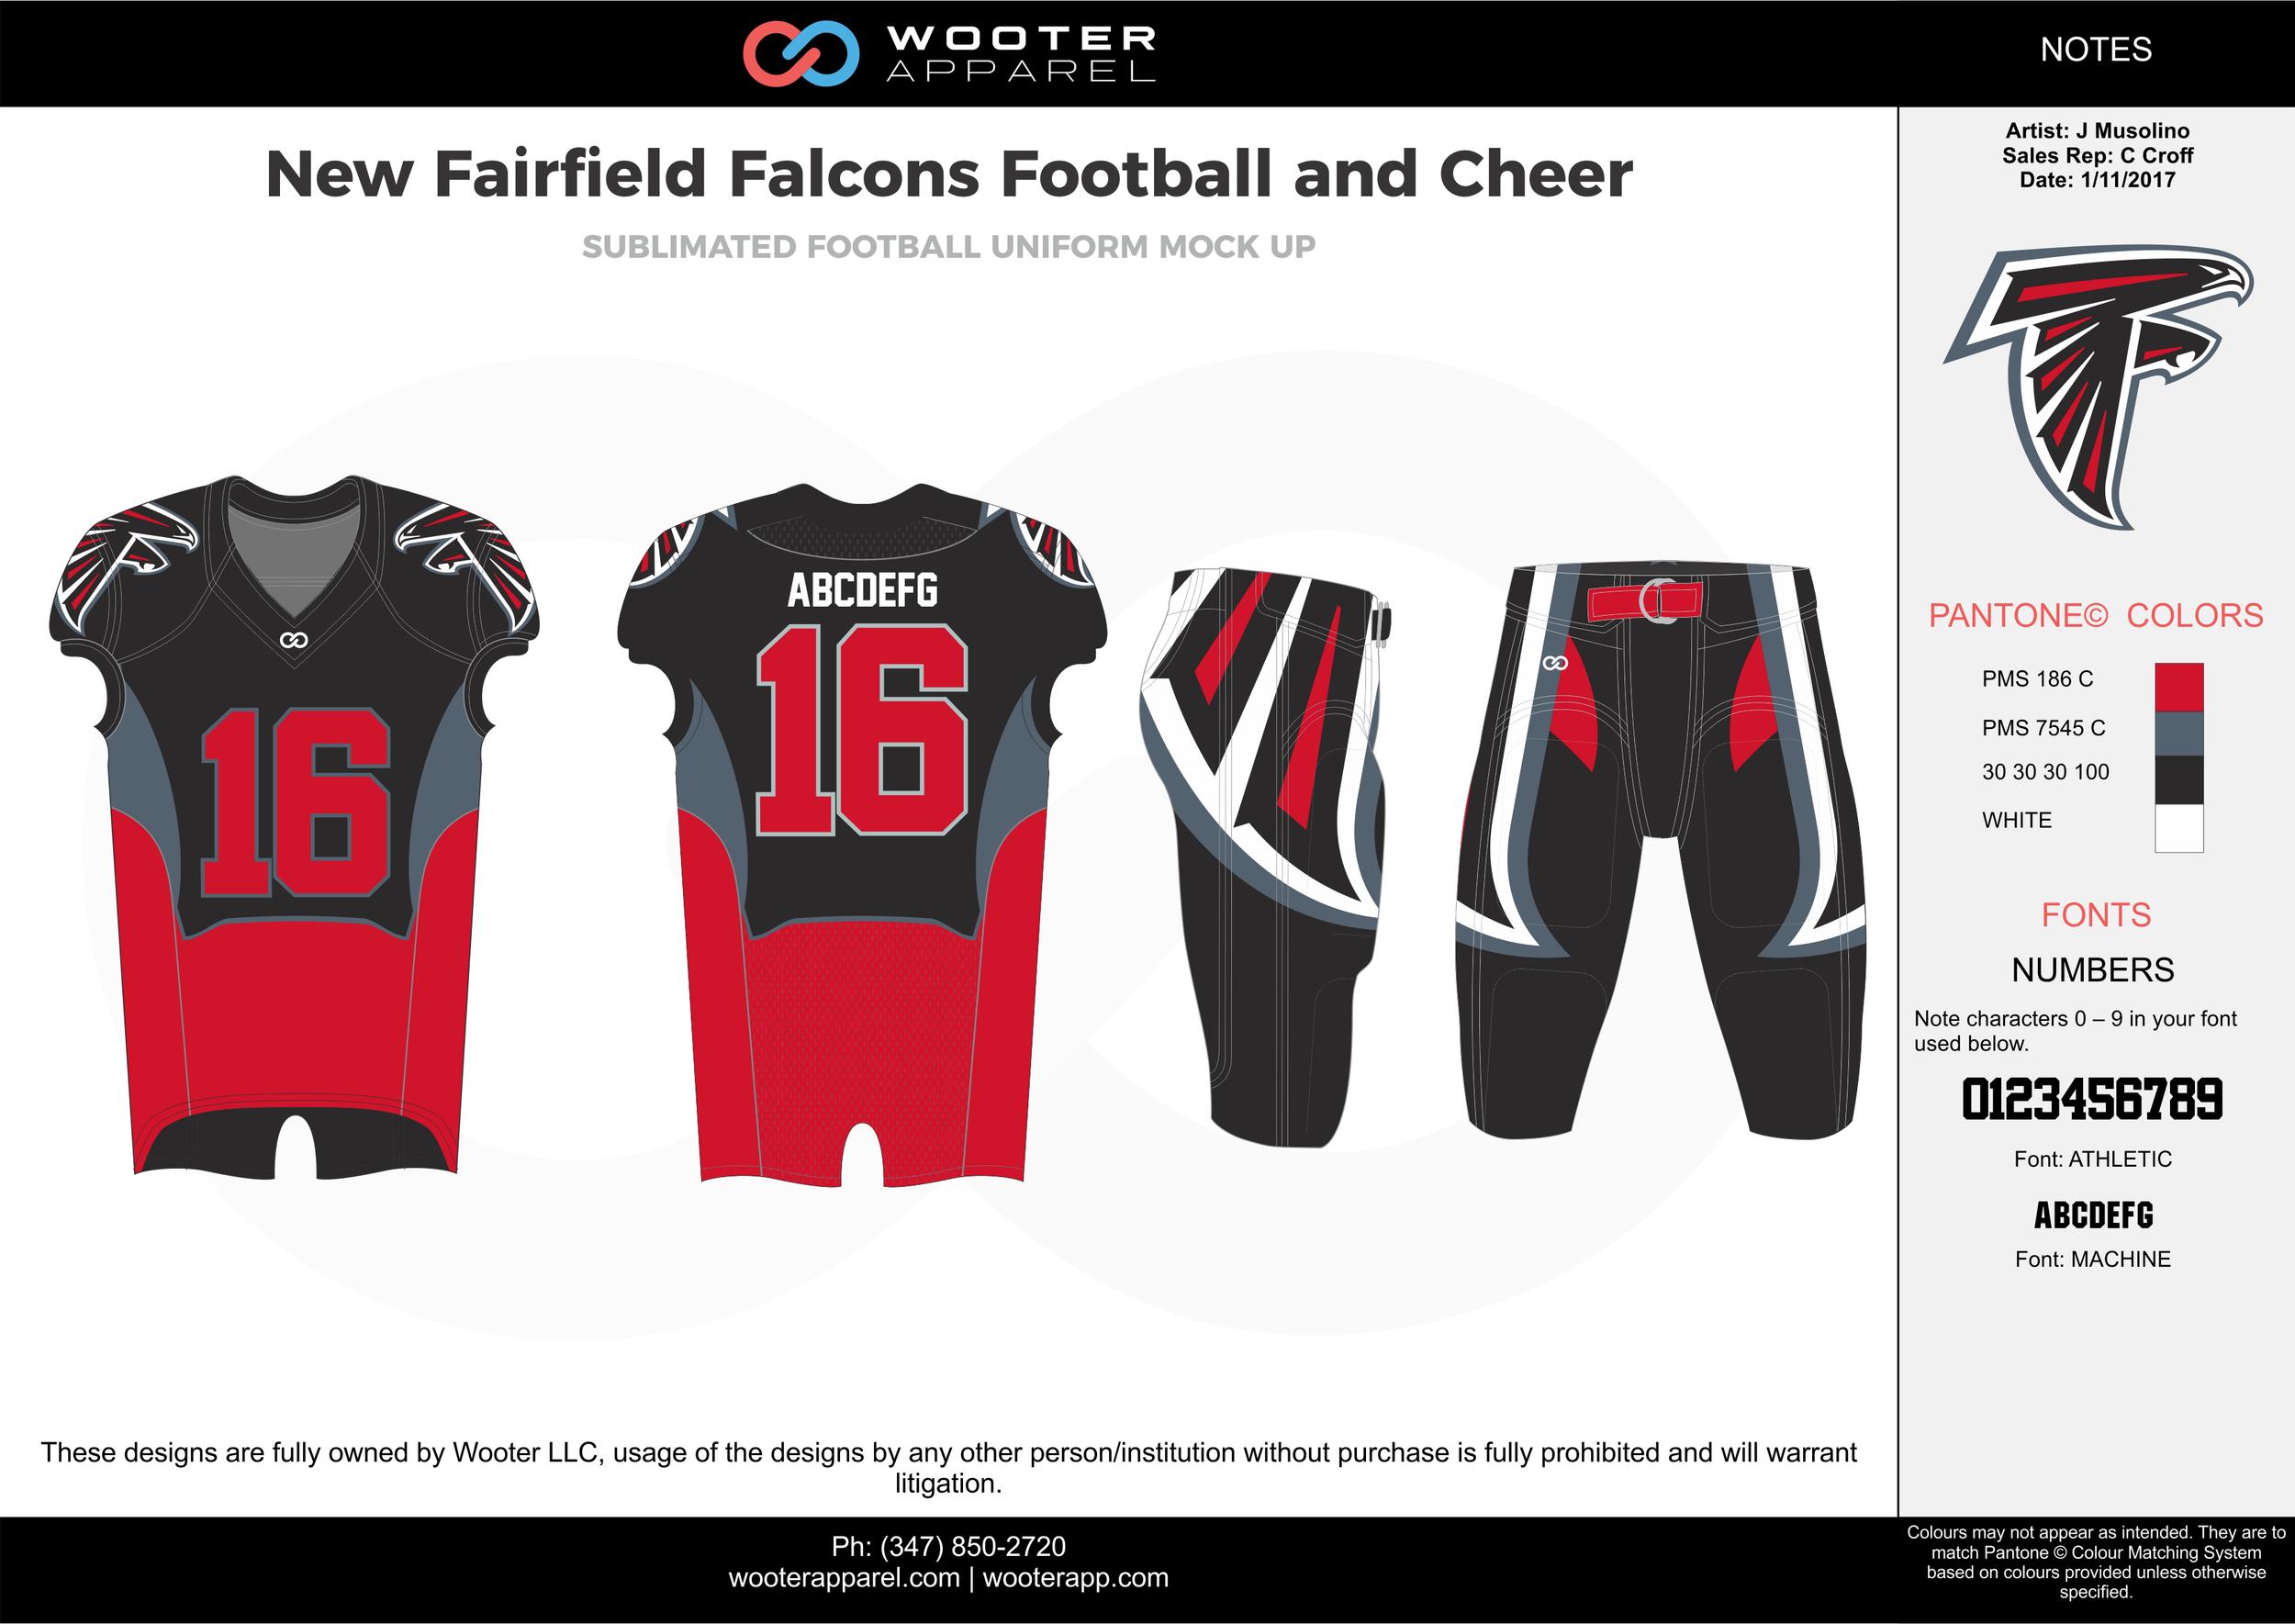 New Fairfield Falcons red black gray white football uniforms jerseys pants